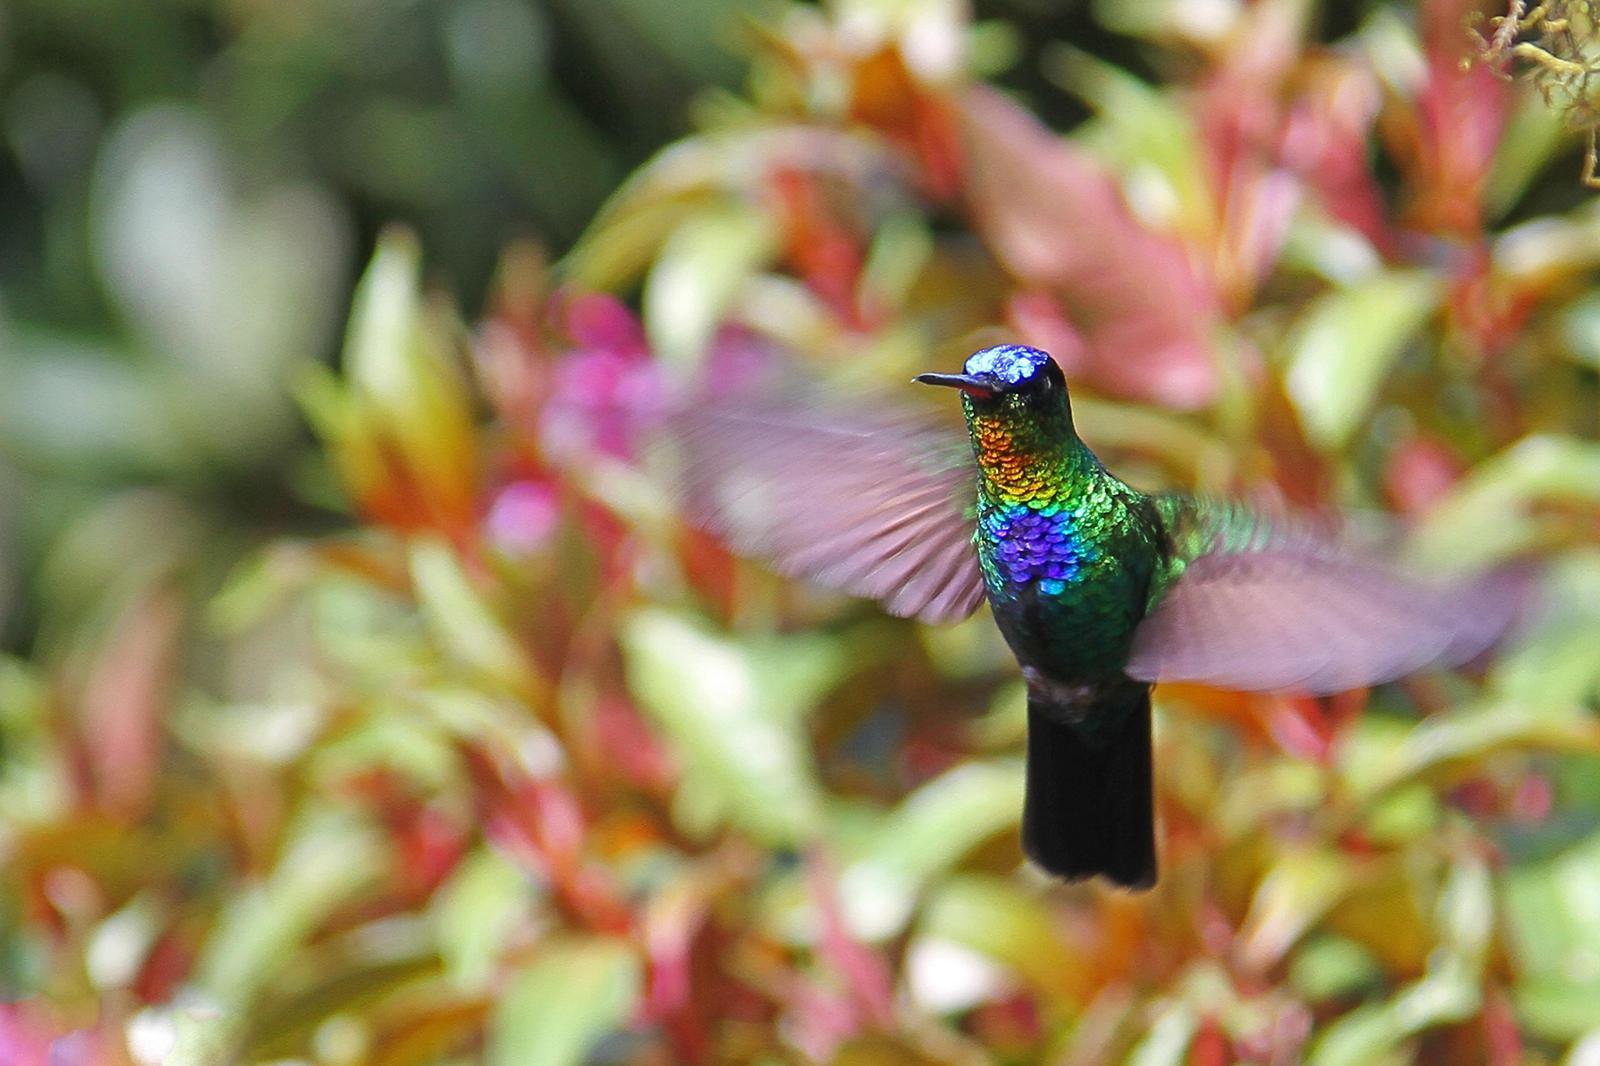 Fiery-throated Hummingbird Photo by Lauren Shaffer